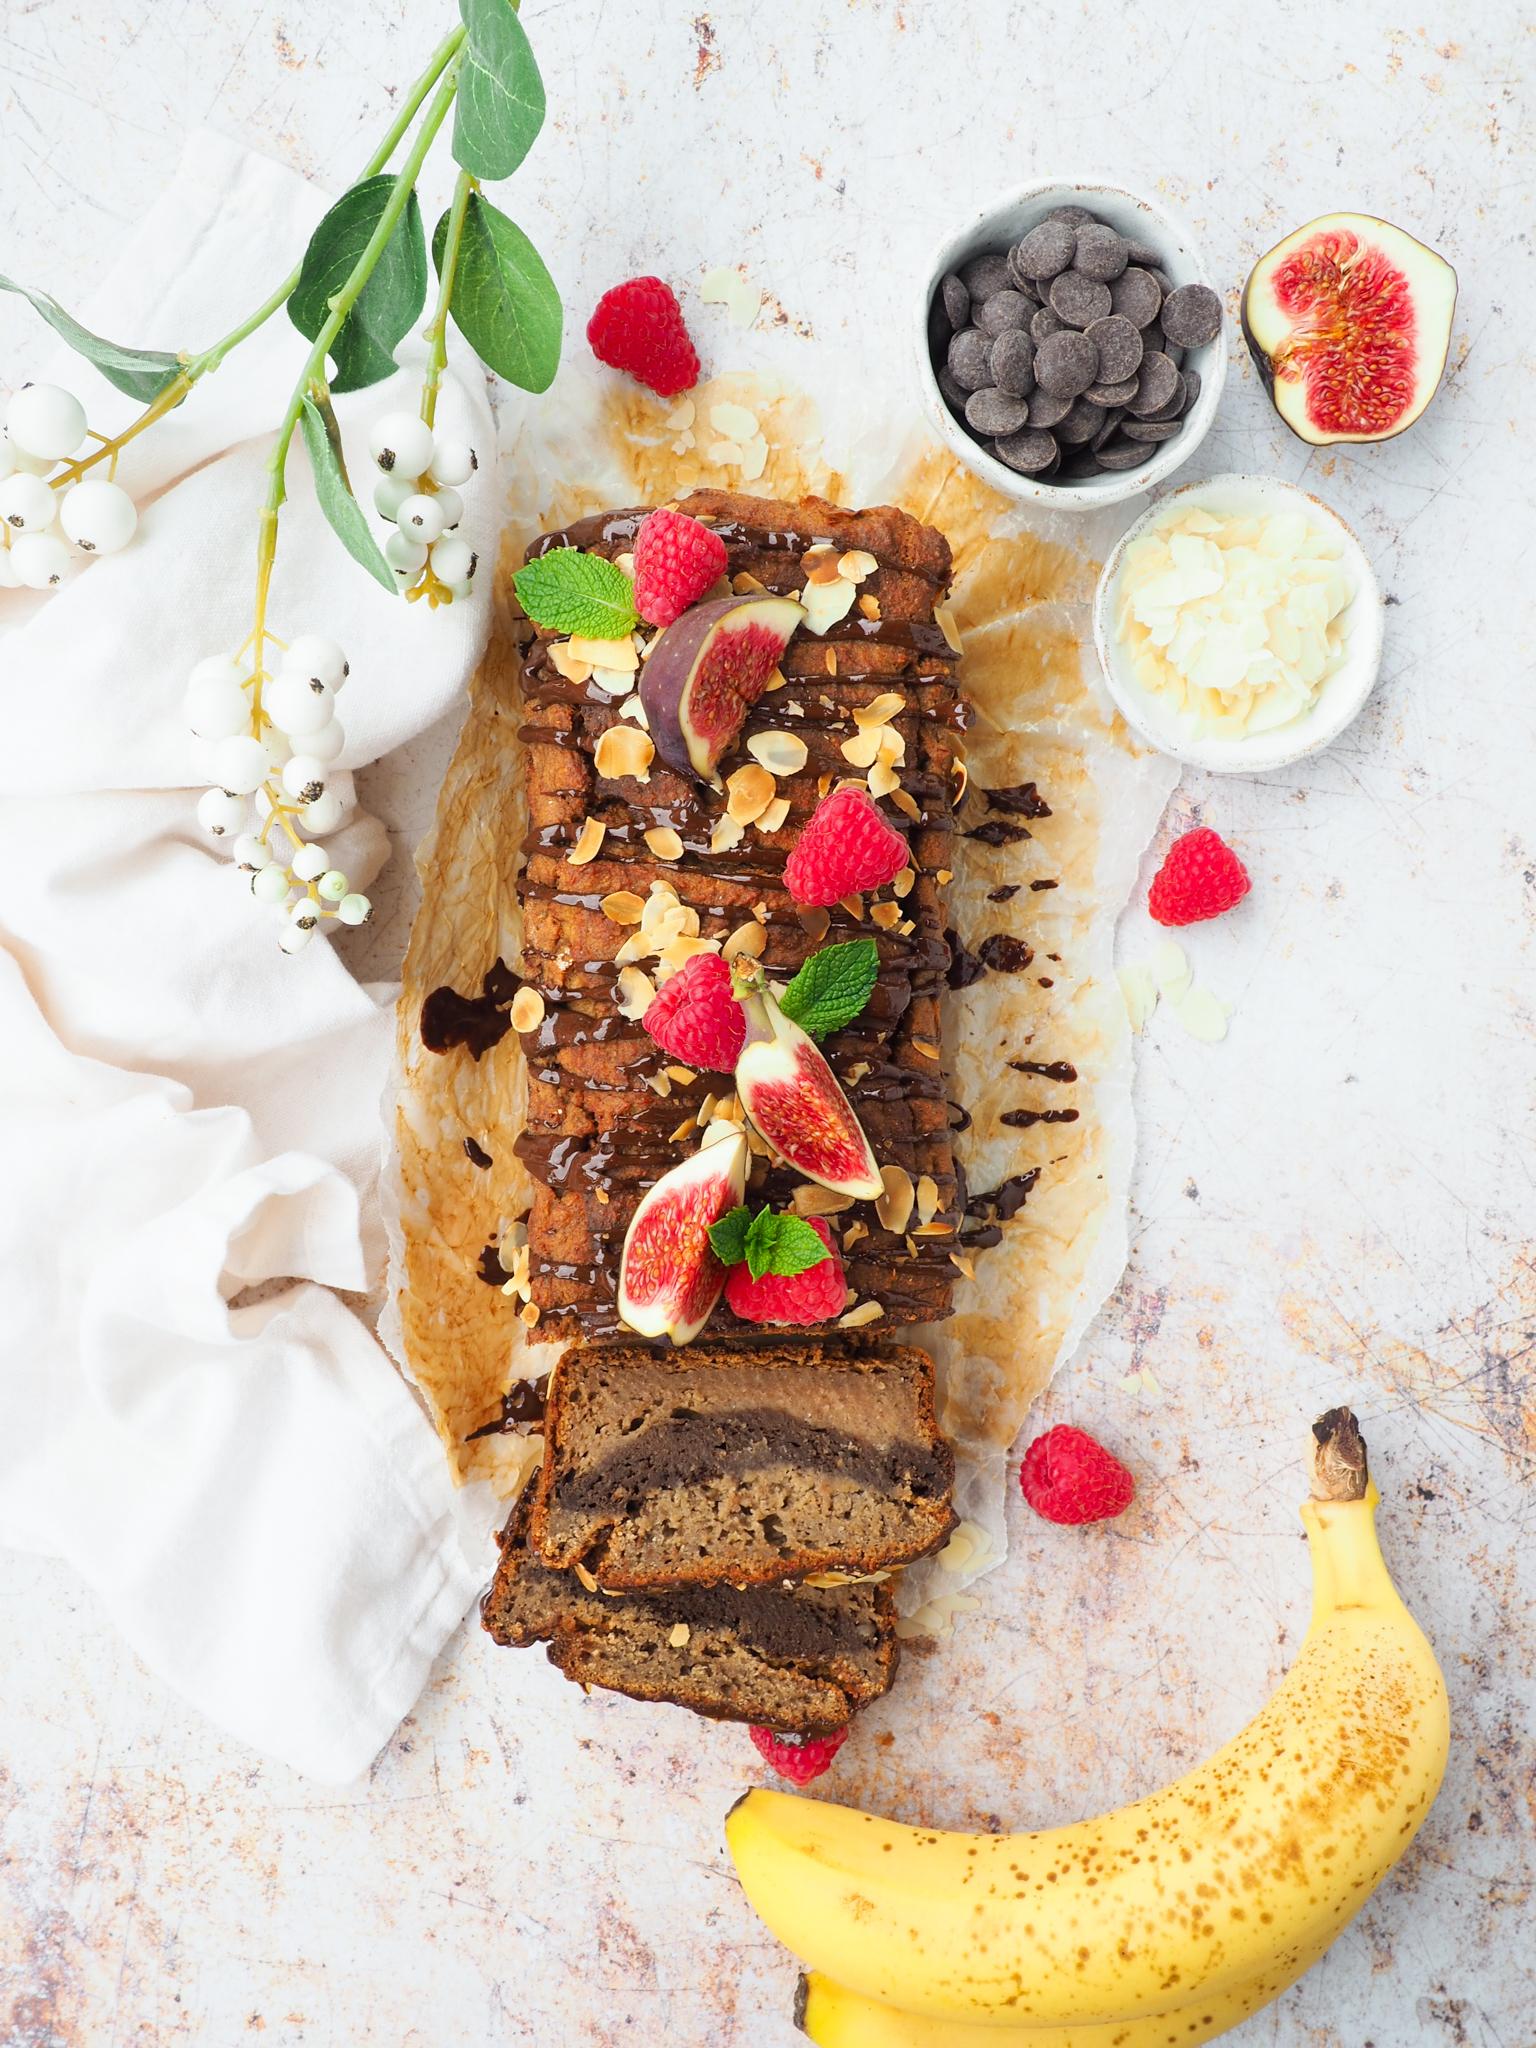 Marmer bananenbrood